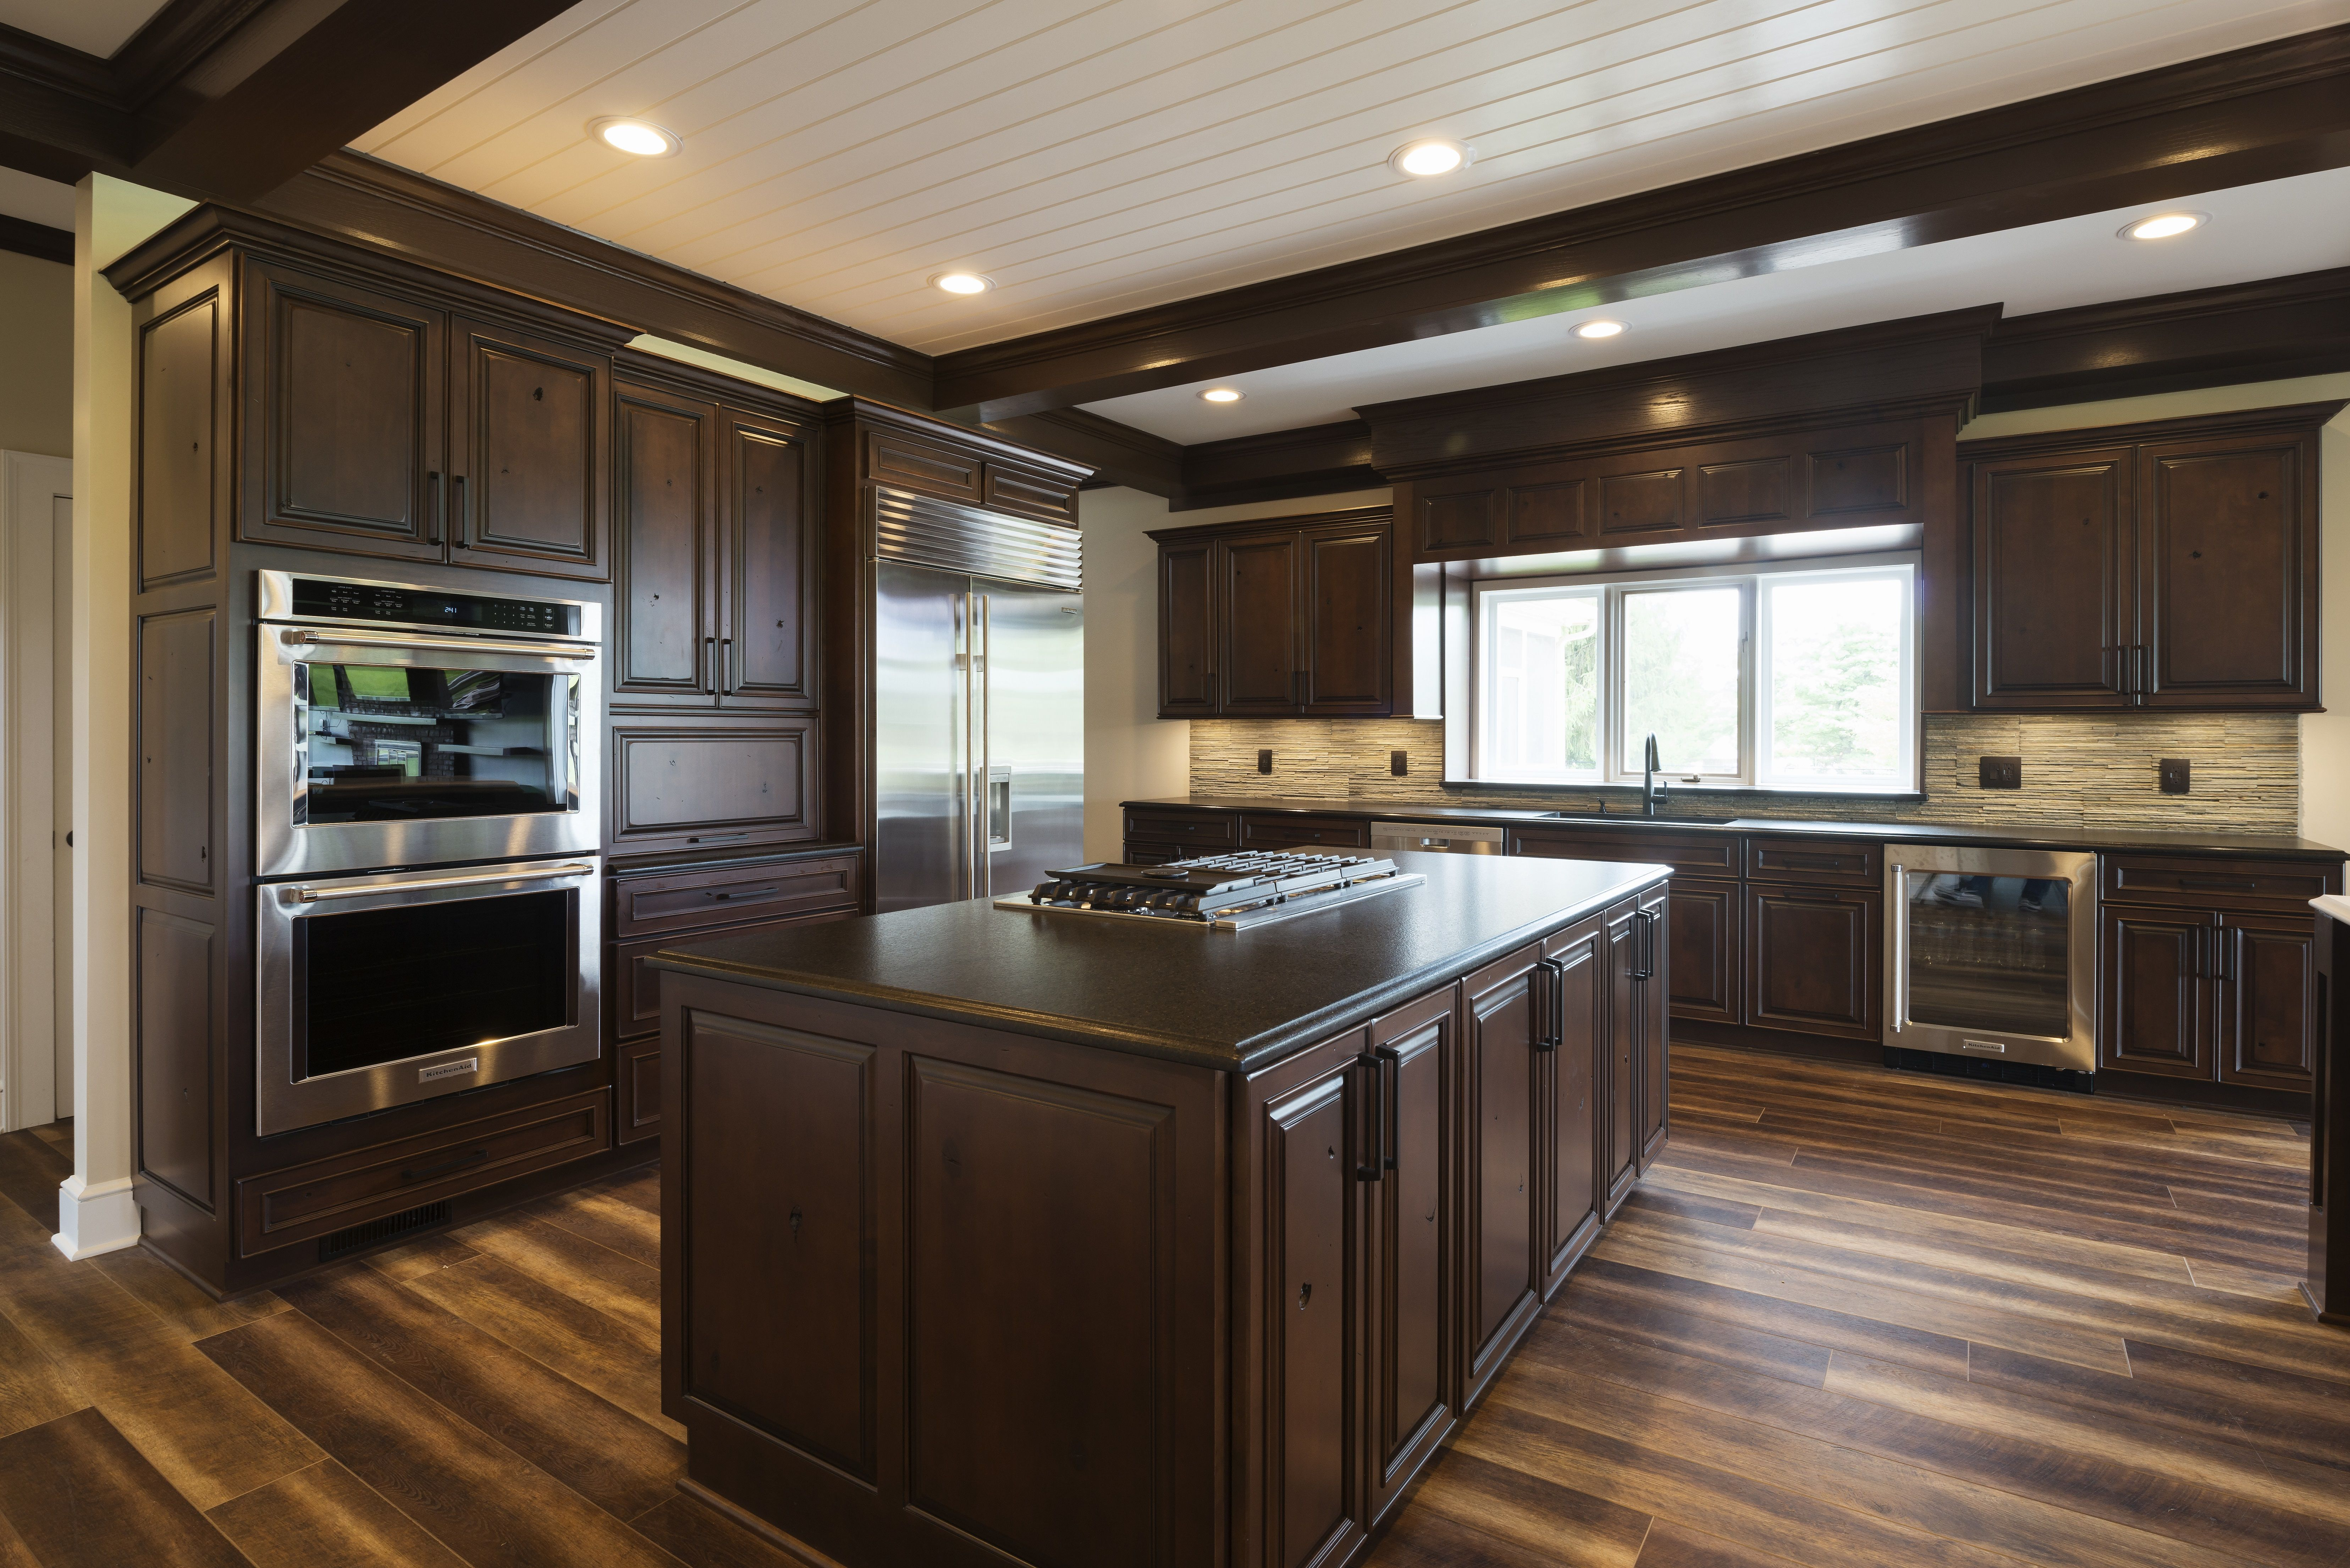 Badezimmer eitelkeiten vermont traditional kitchen remodel in indiana wood floors stained